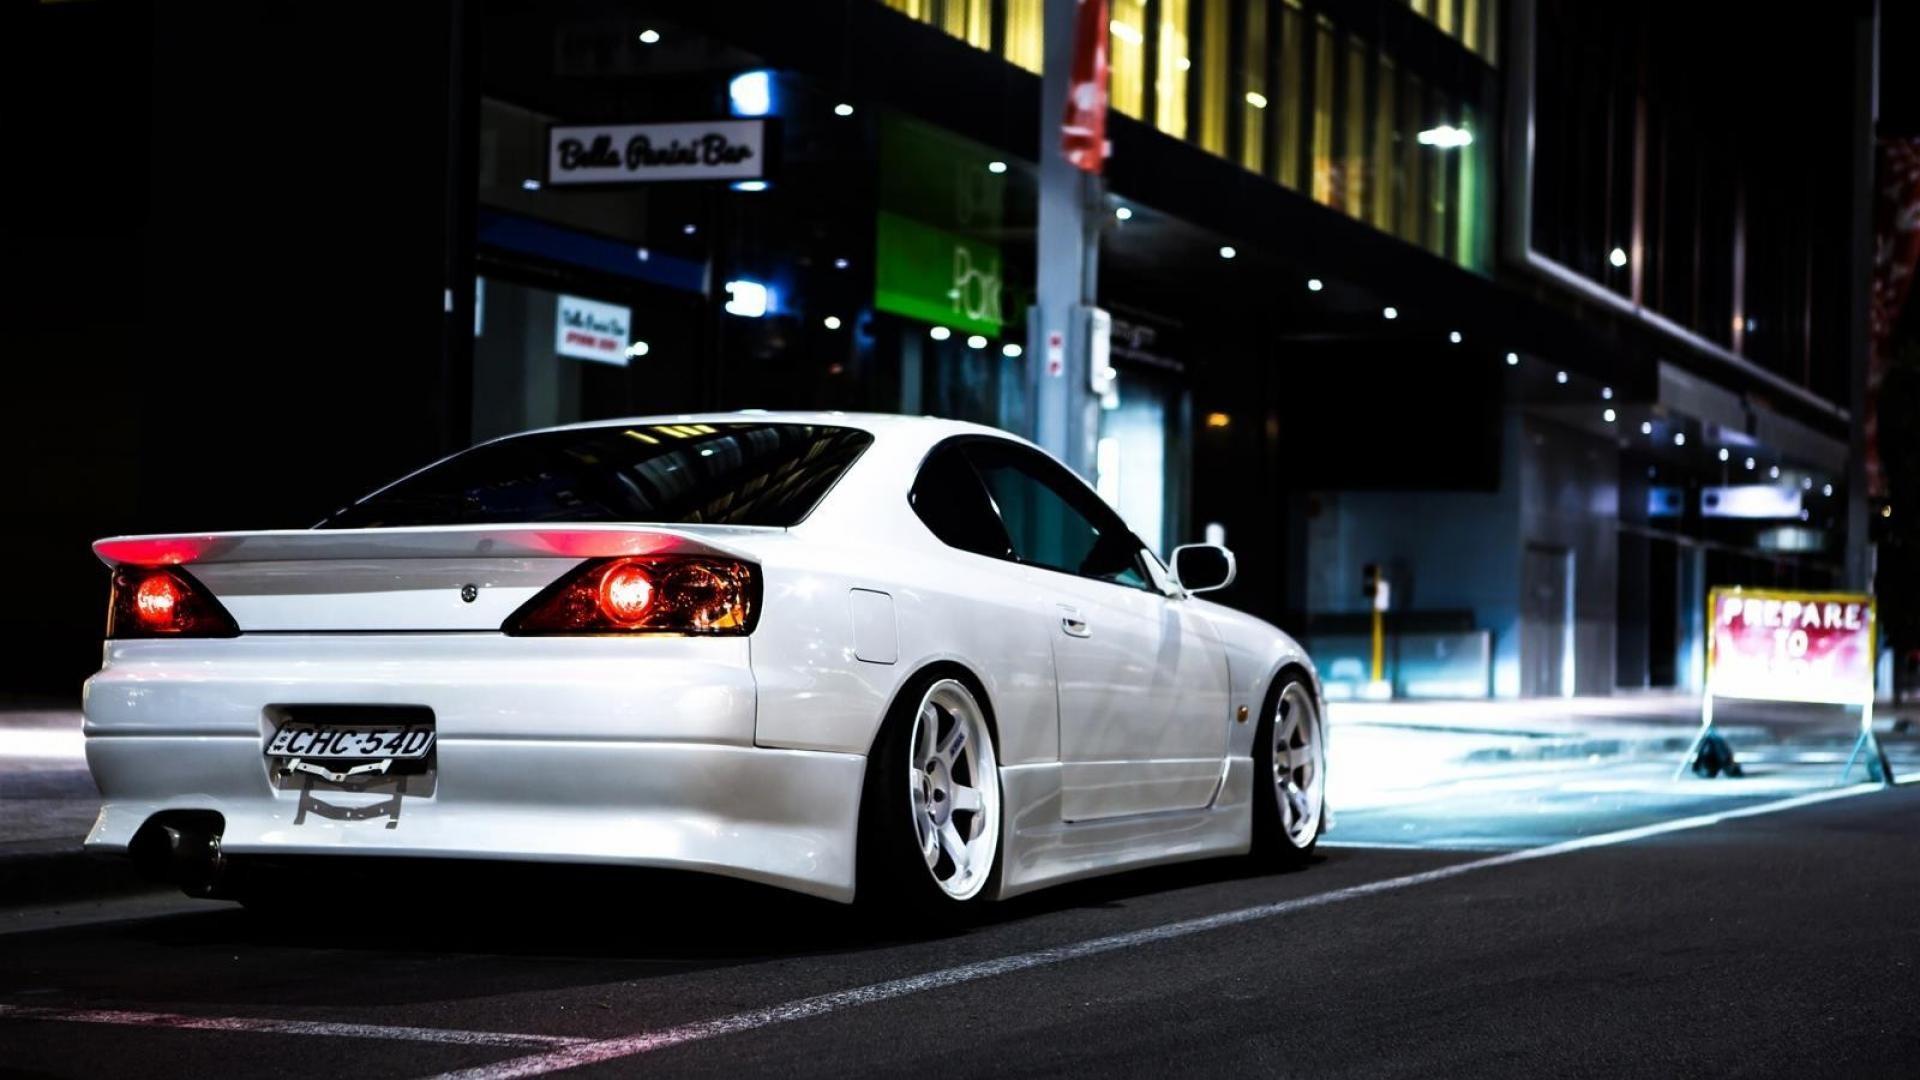 Subaru Hd Wallpapers >> Jdm Wallpapers HD (73+ images)